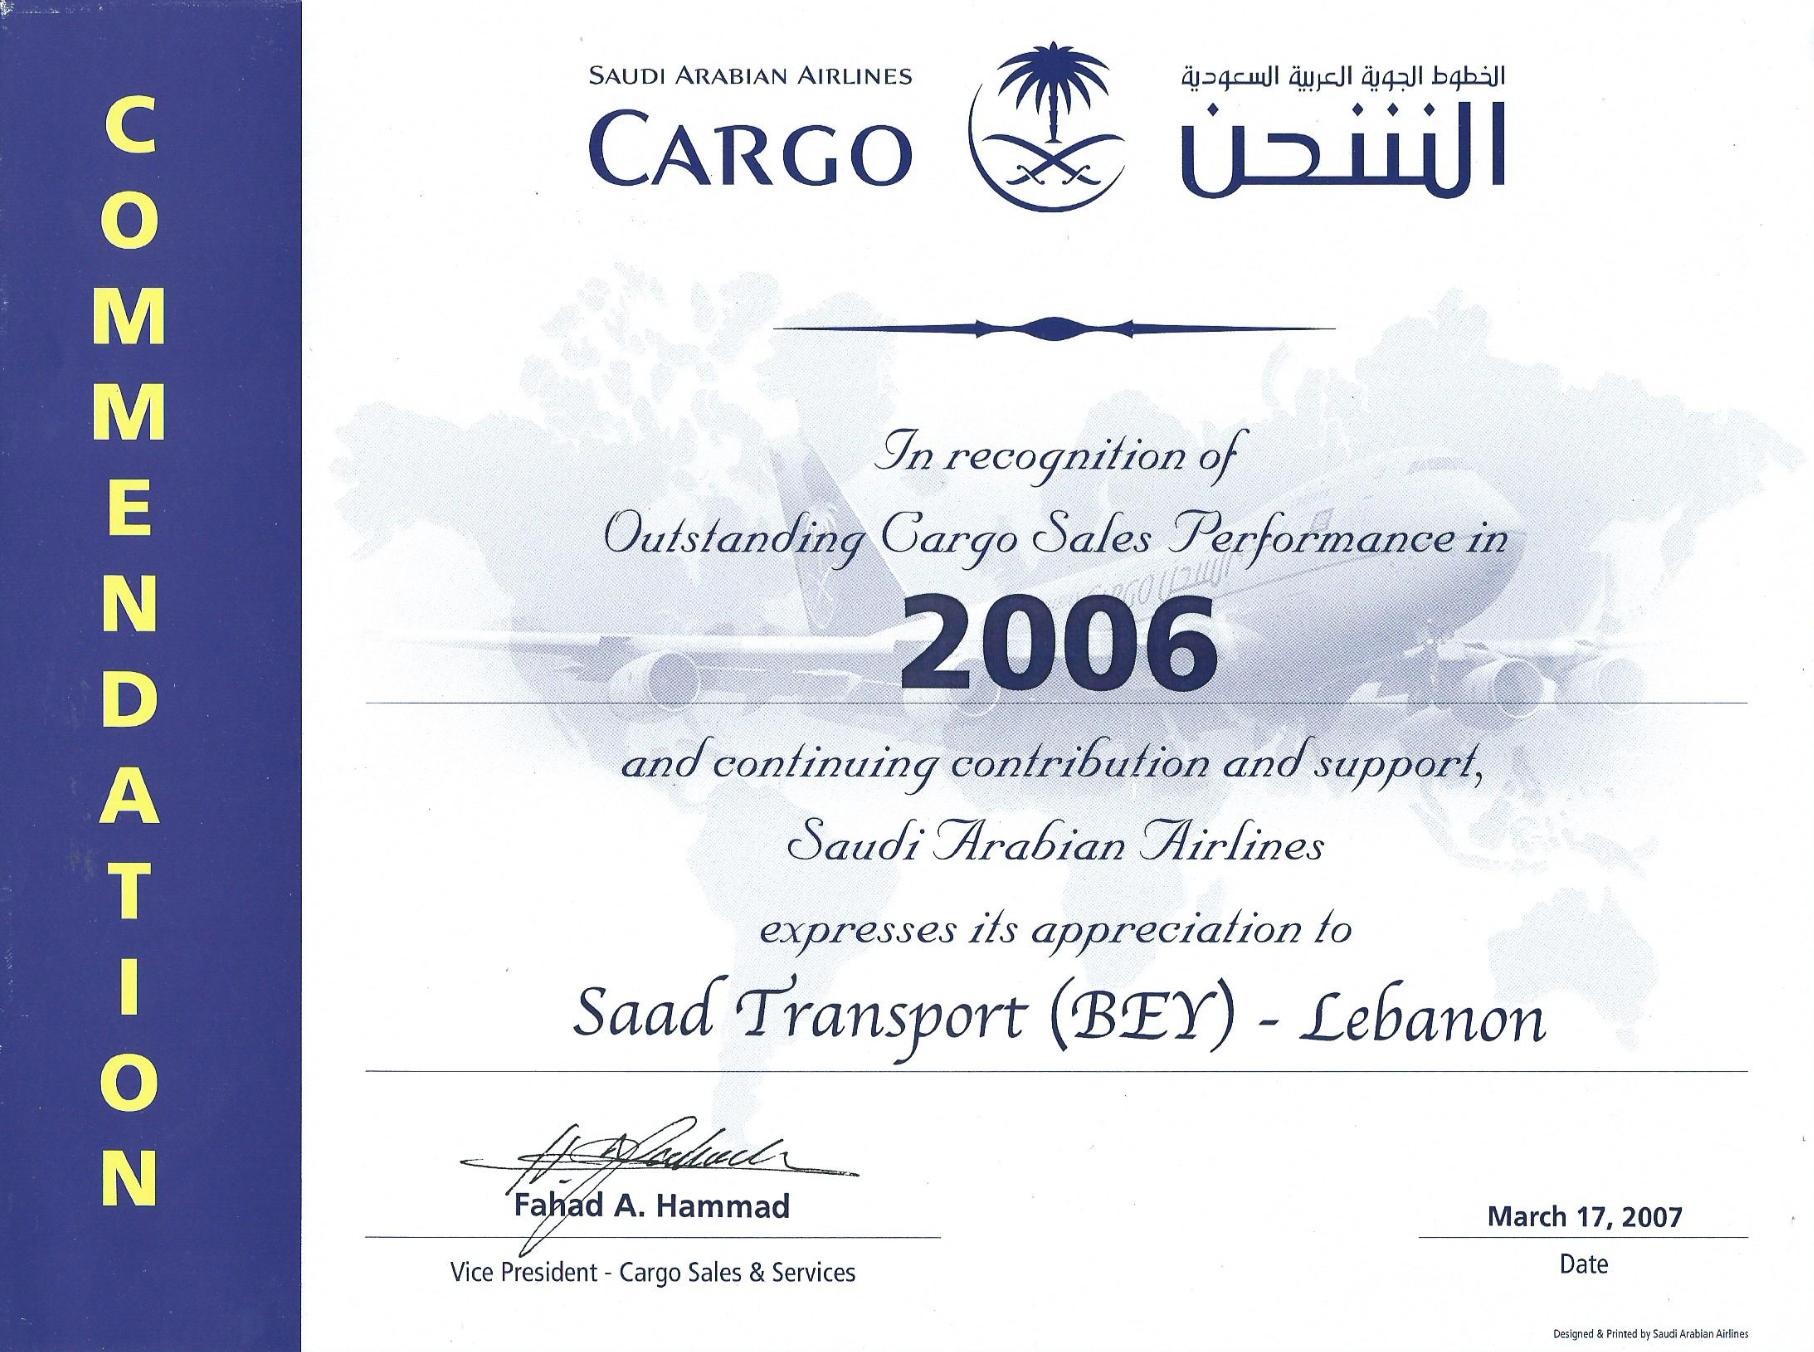 Outstanding Cargo Performance 2006